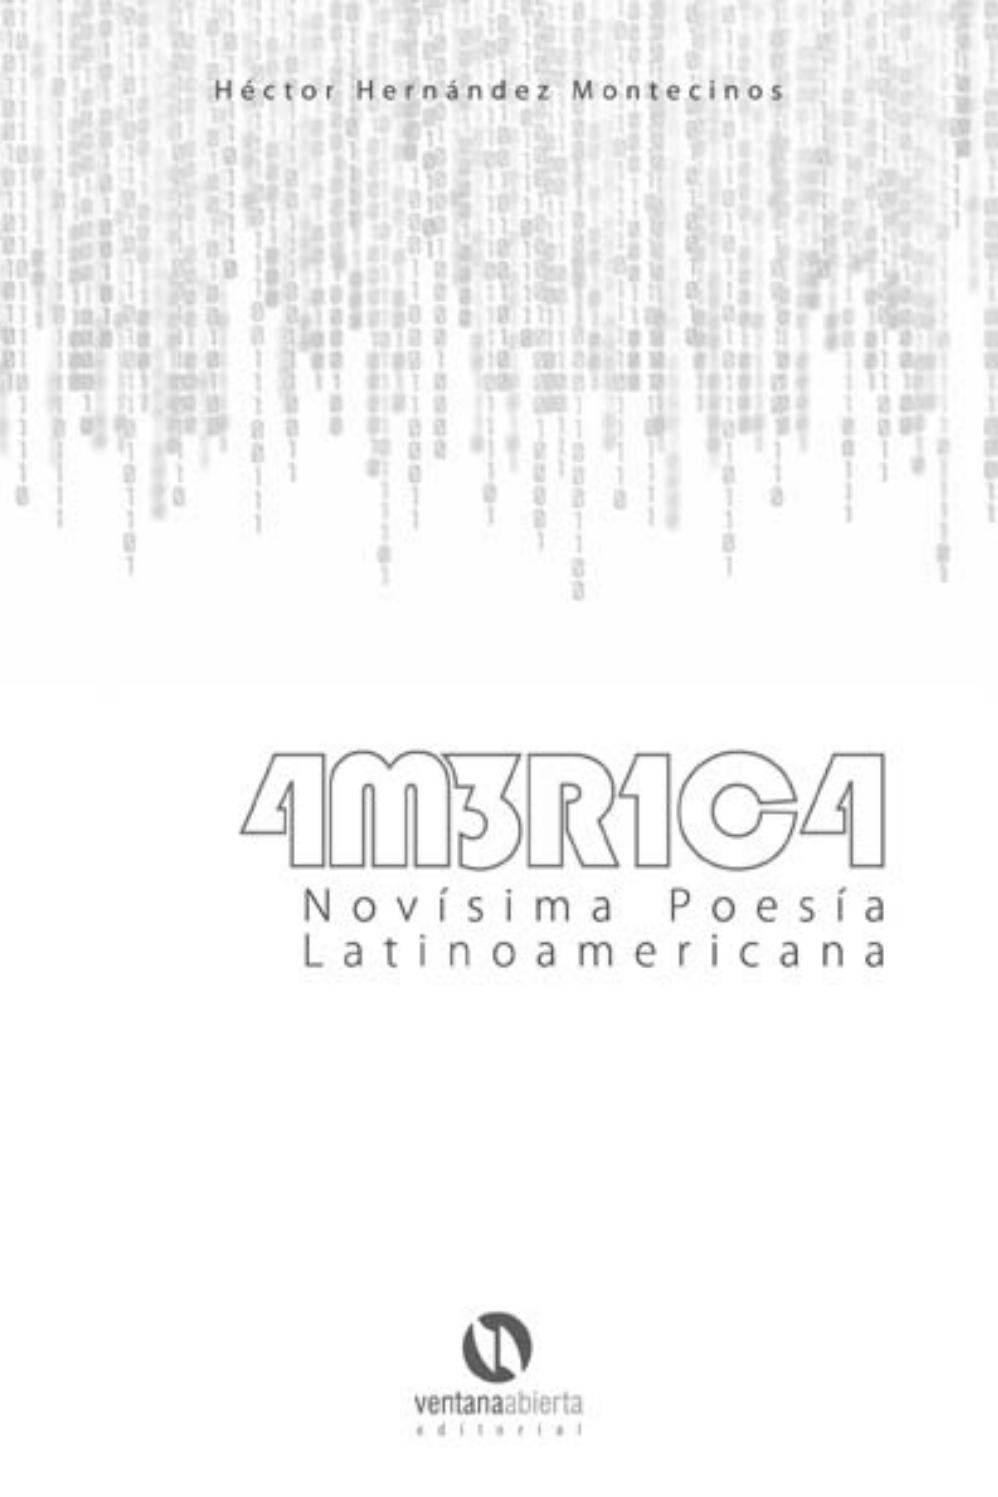 4M3R1C4 by Sawabona Ediciones - issuu